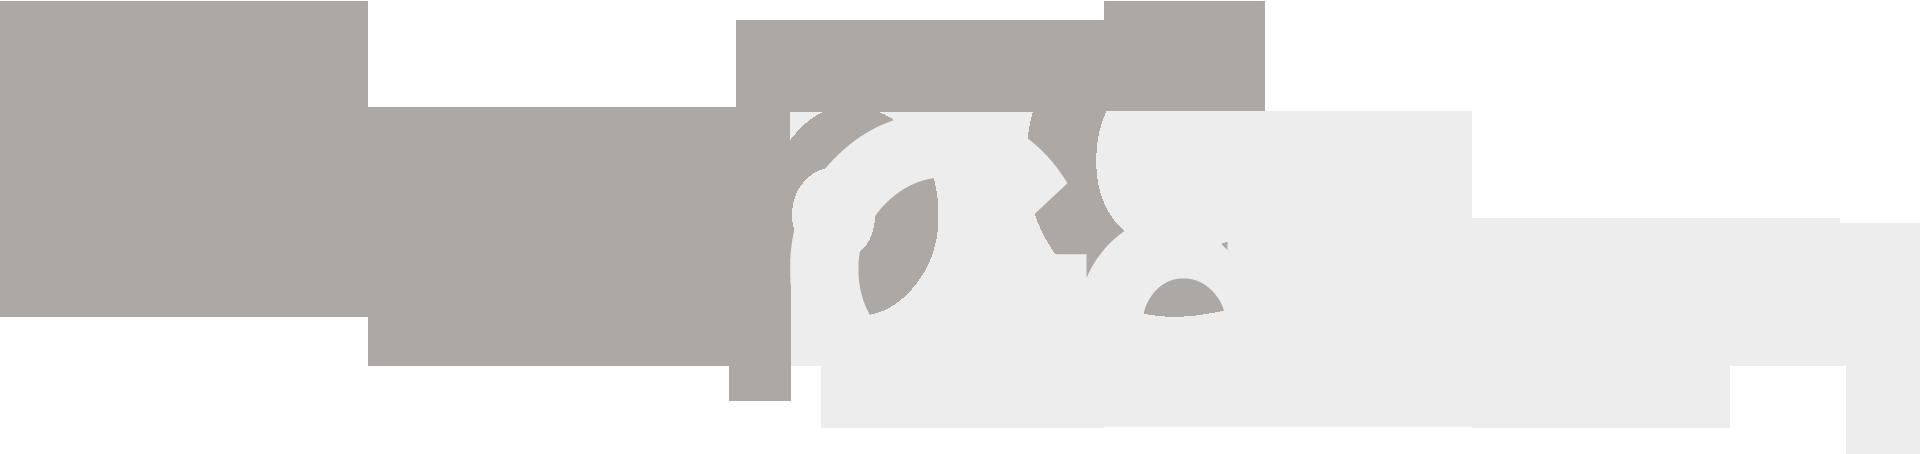 groupC-gallery-bgbot